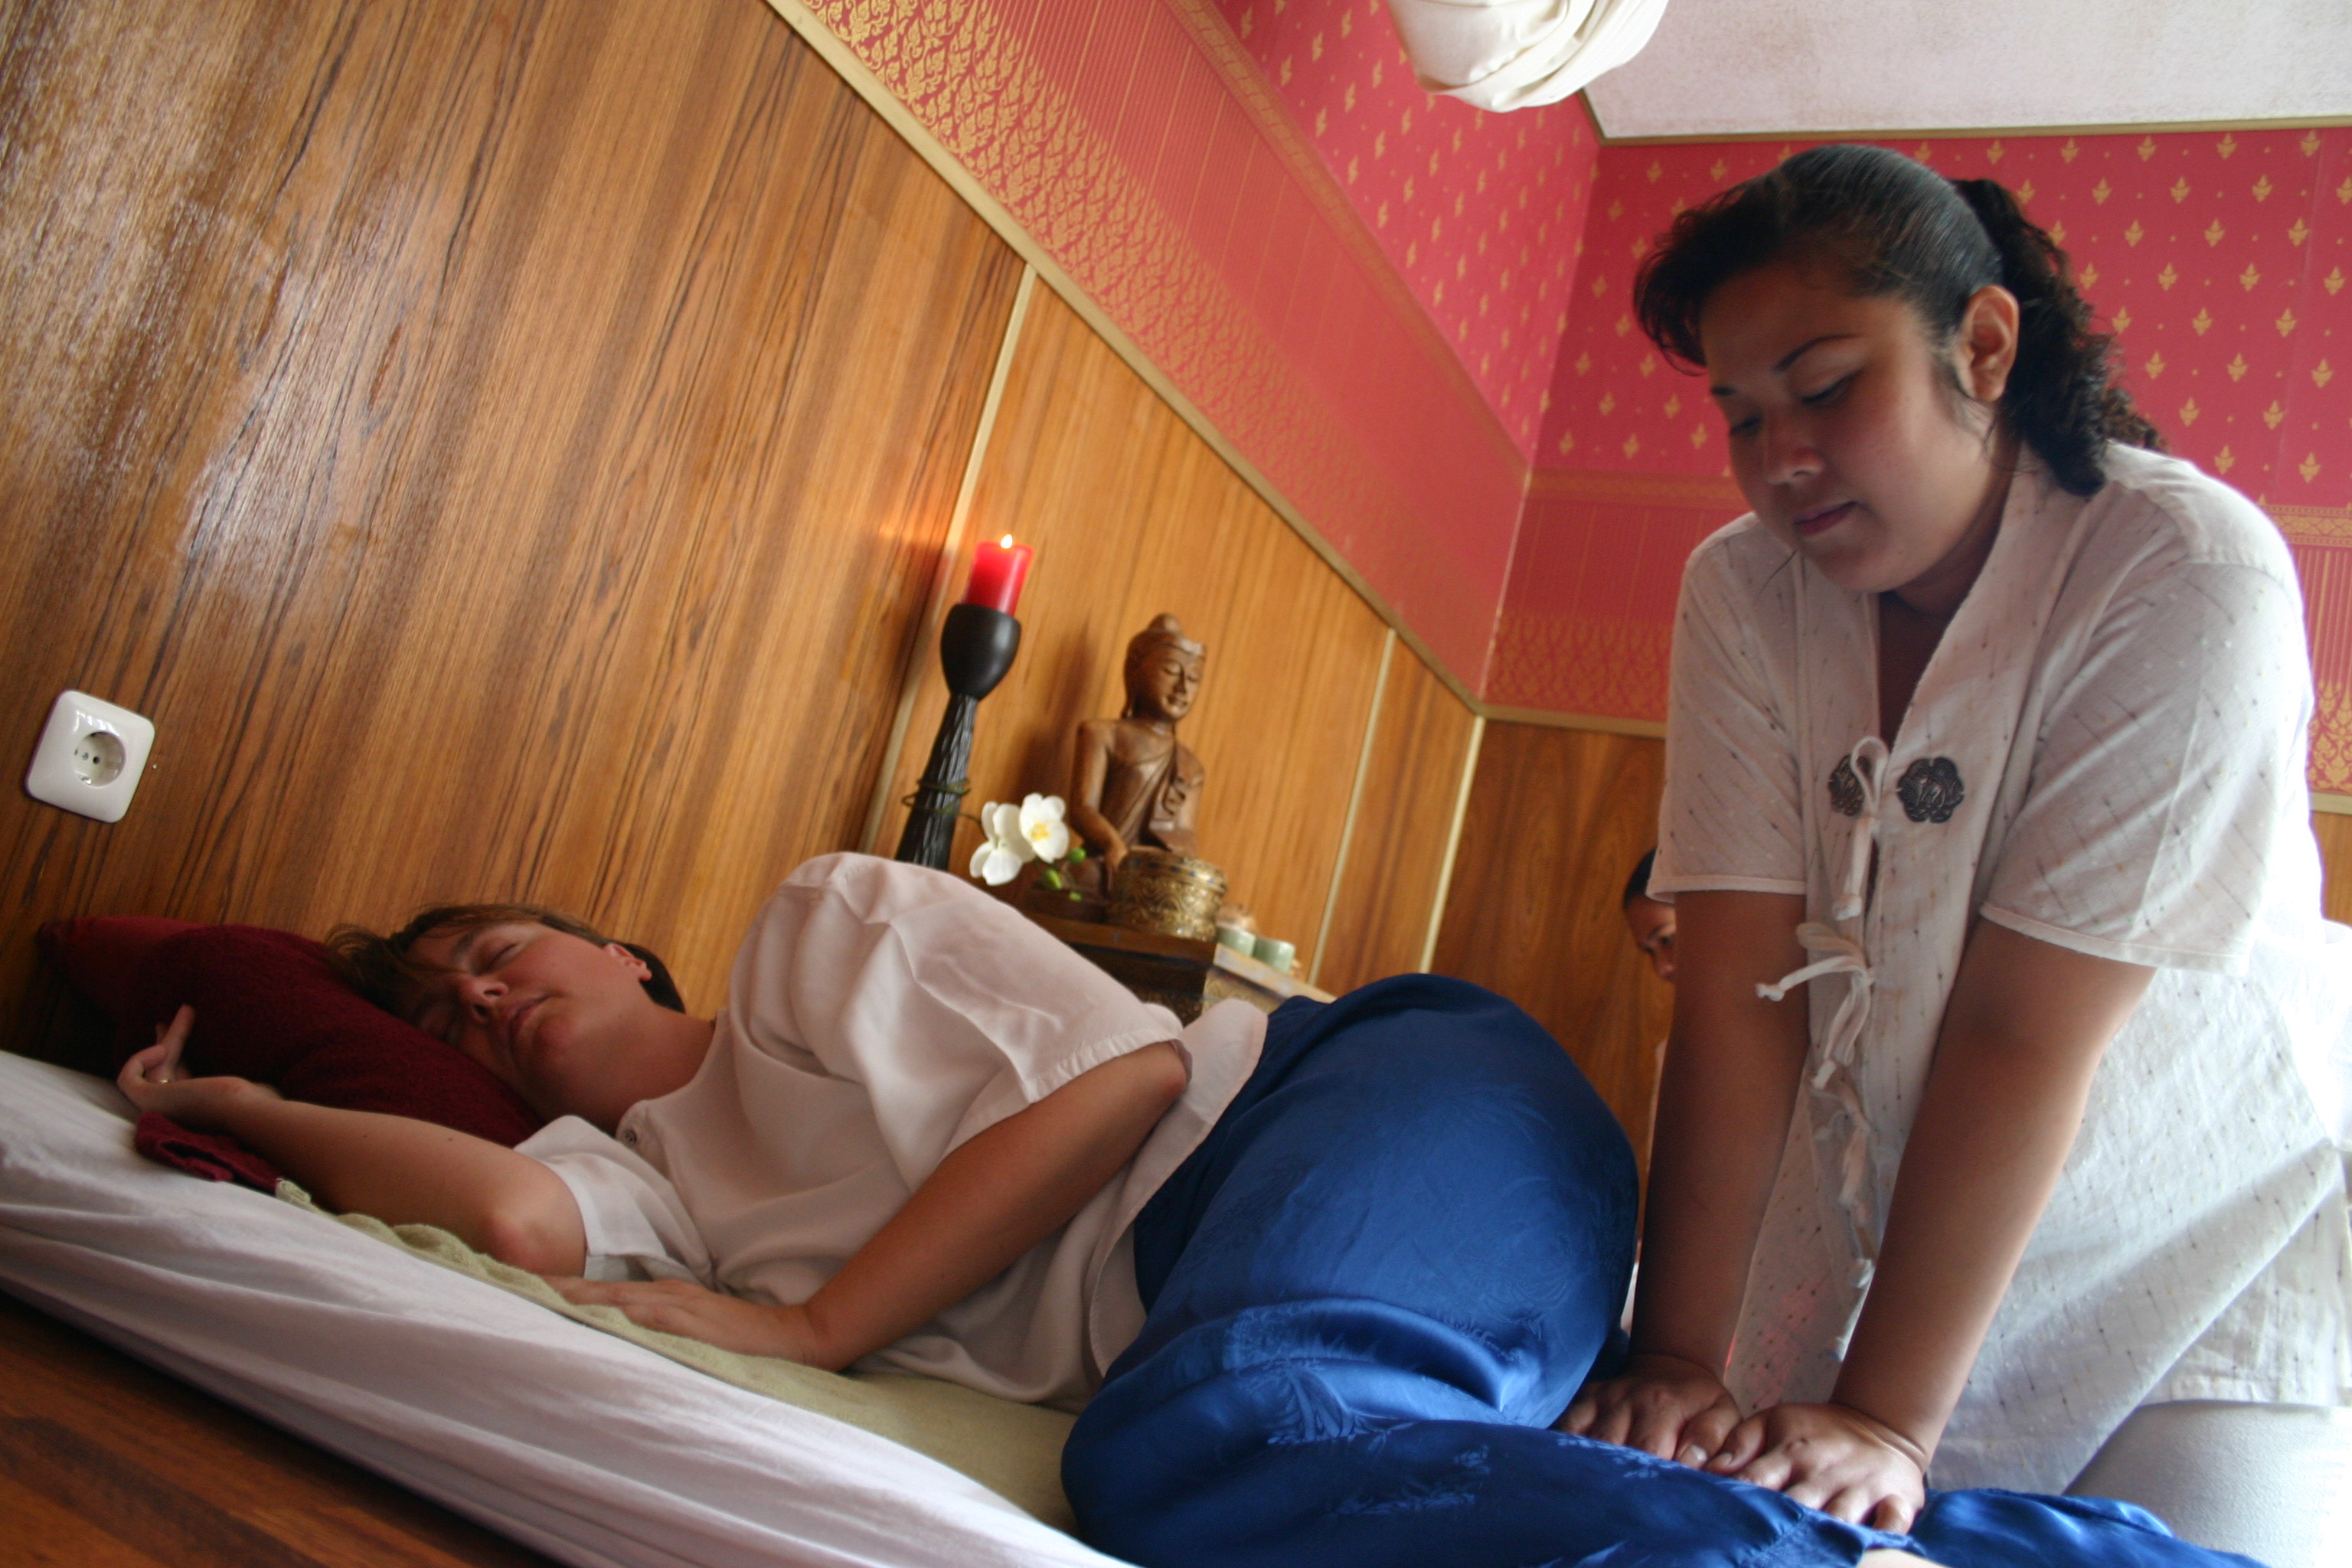 oily sensual massage five star brothel